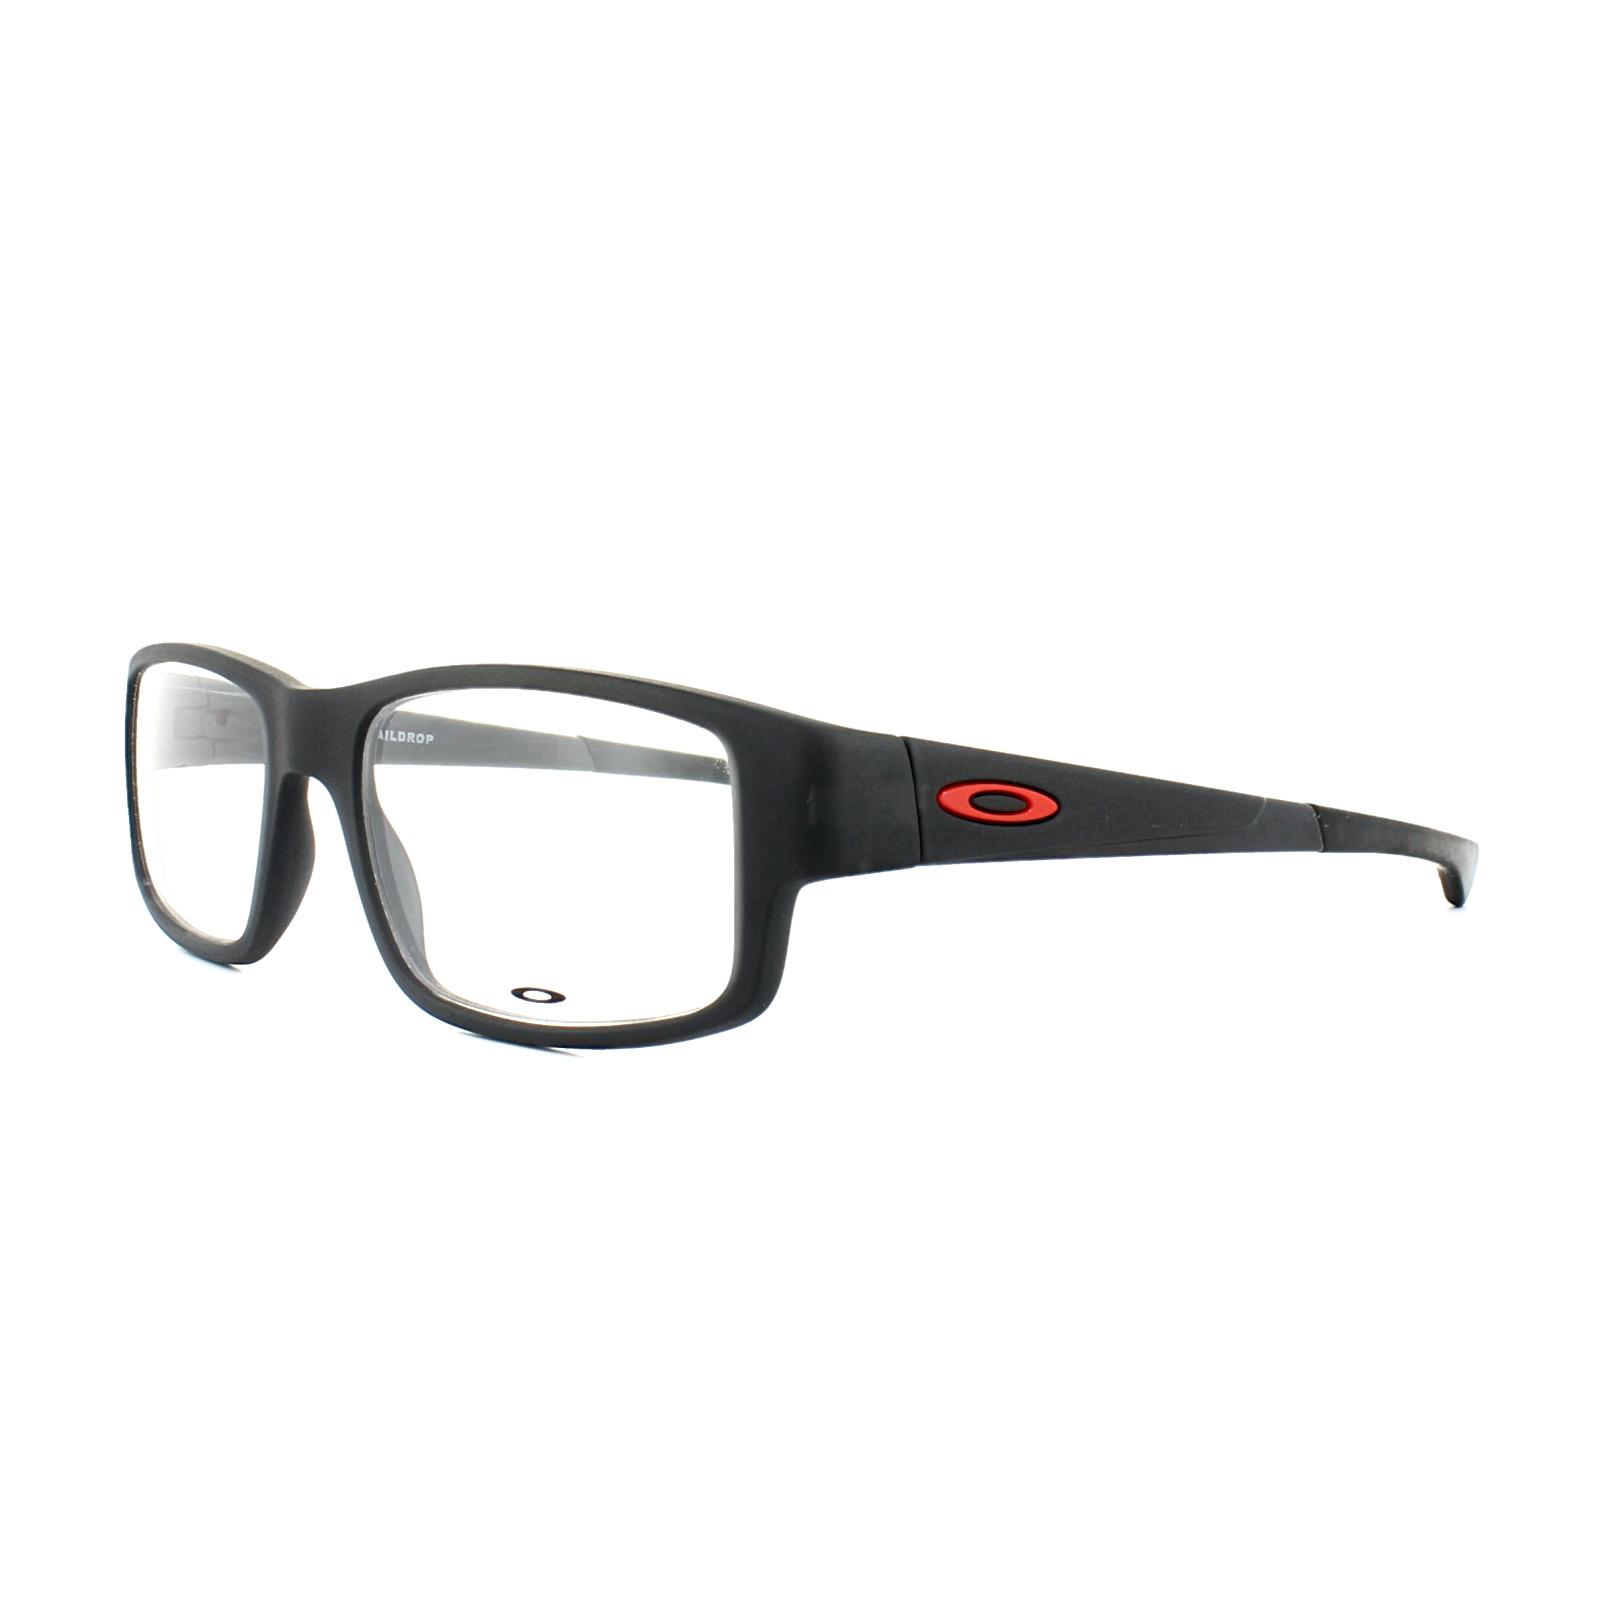 89cabcbca3 Details about Oakley Glasses Frames Taildrop OX8104-02 Satin Black Ink Mens  52mm